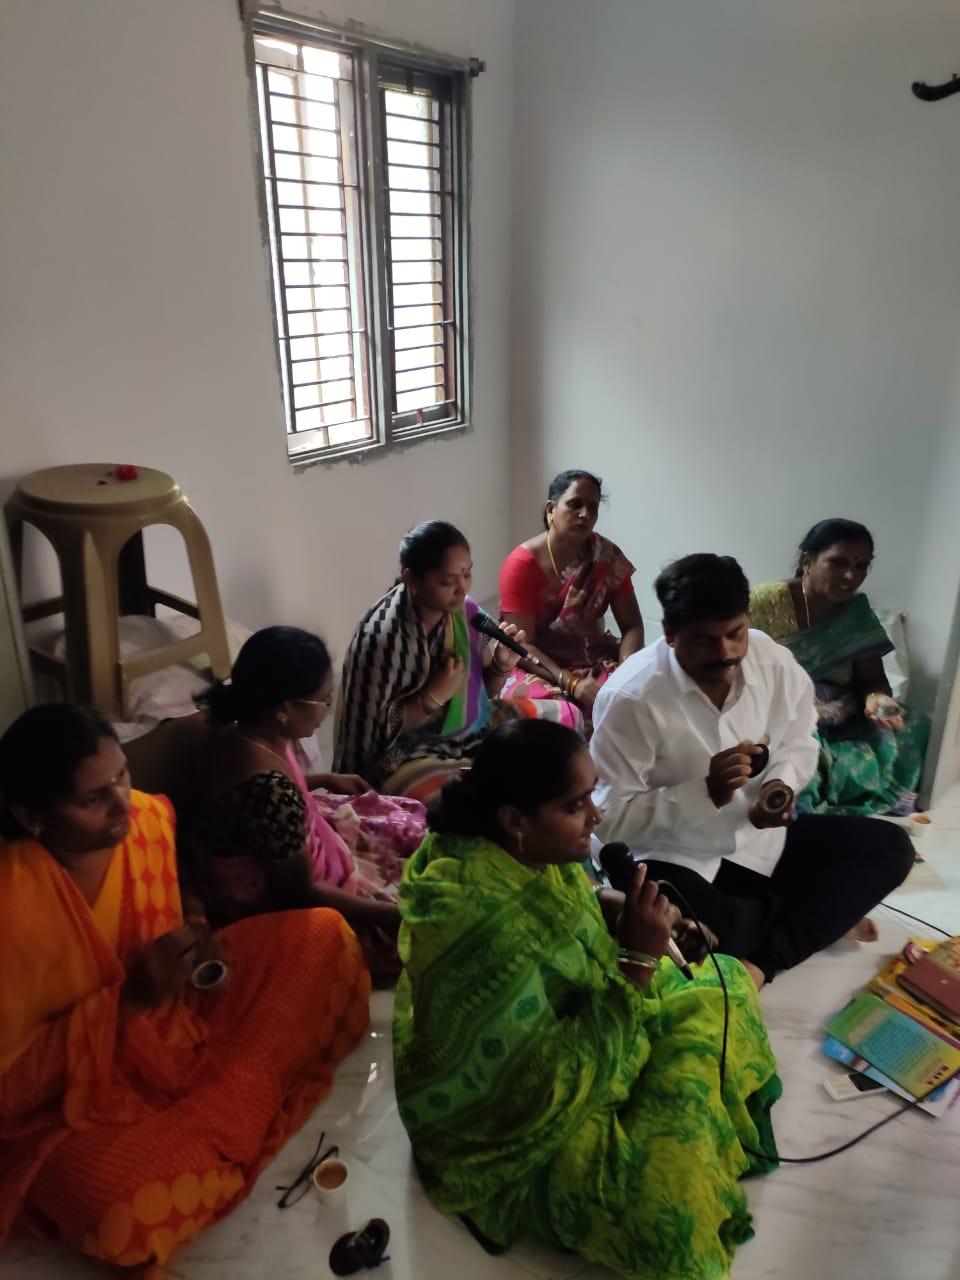 India-Seetharampuram-Weekly Aaradhana at Ashram on 04-March-2020